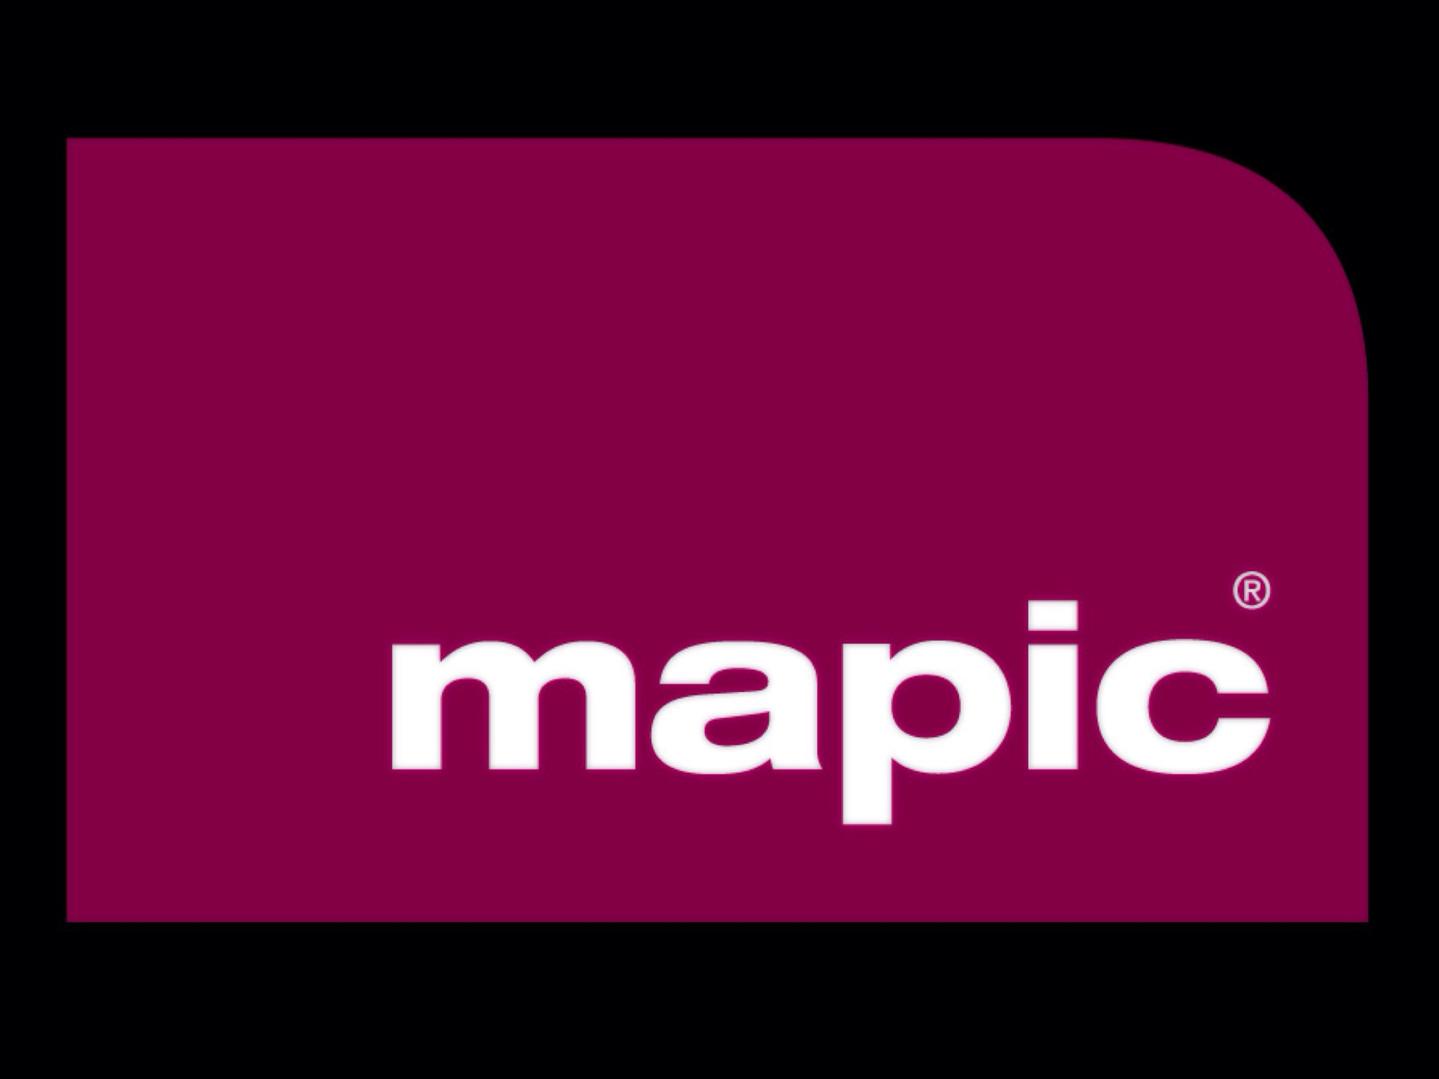 MAPIC